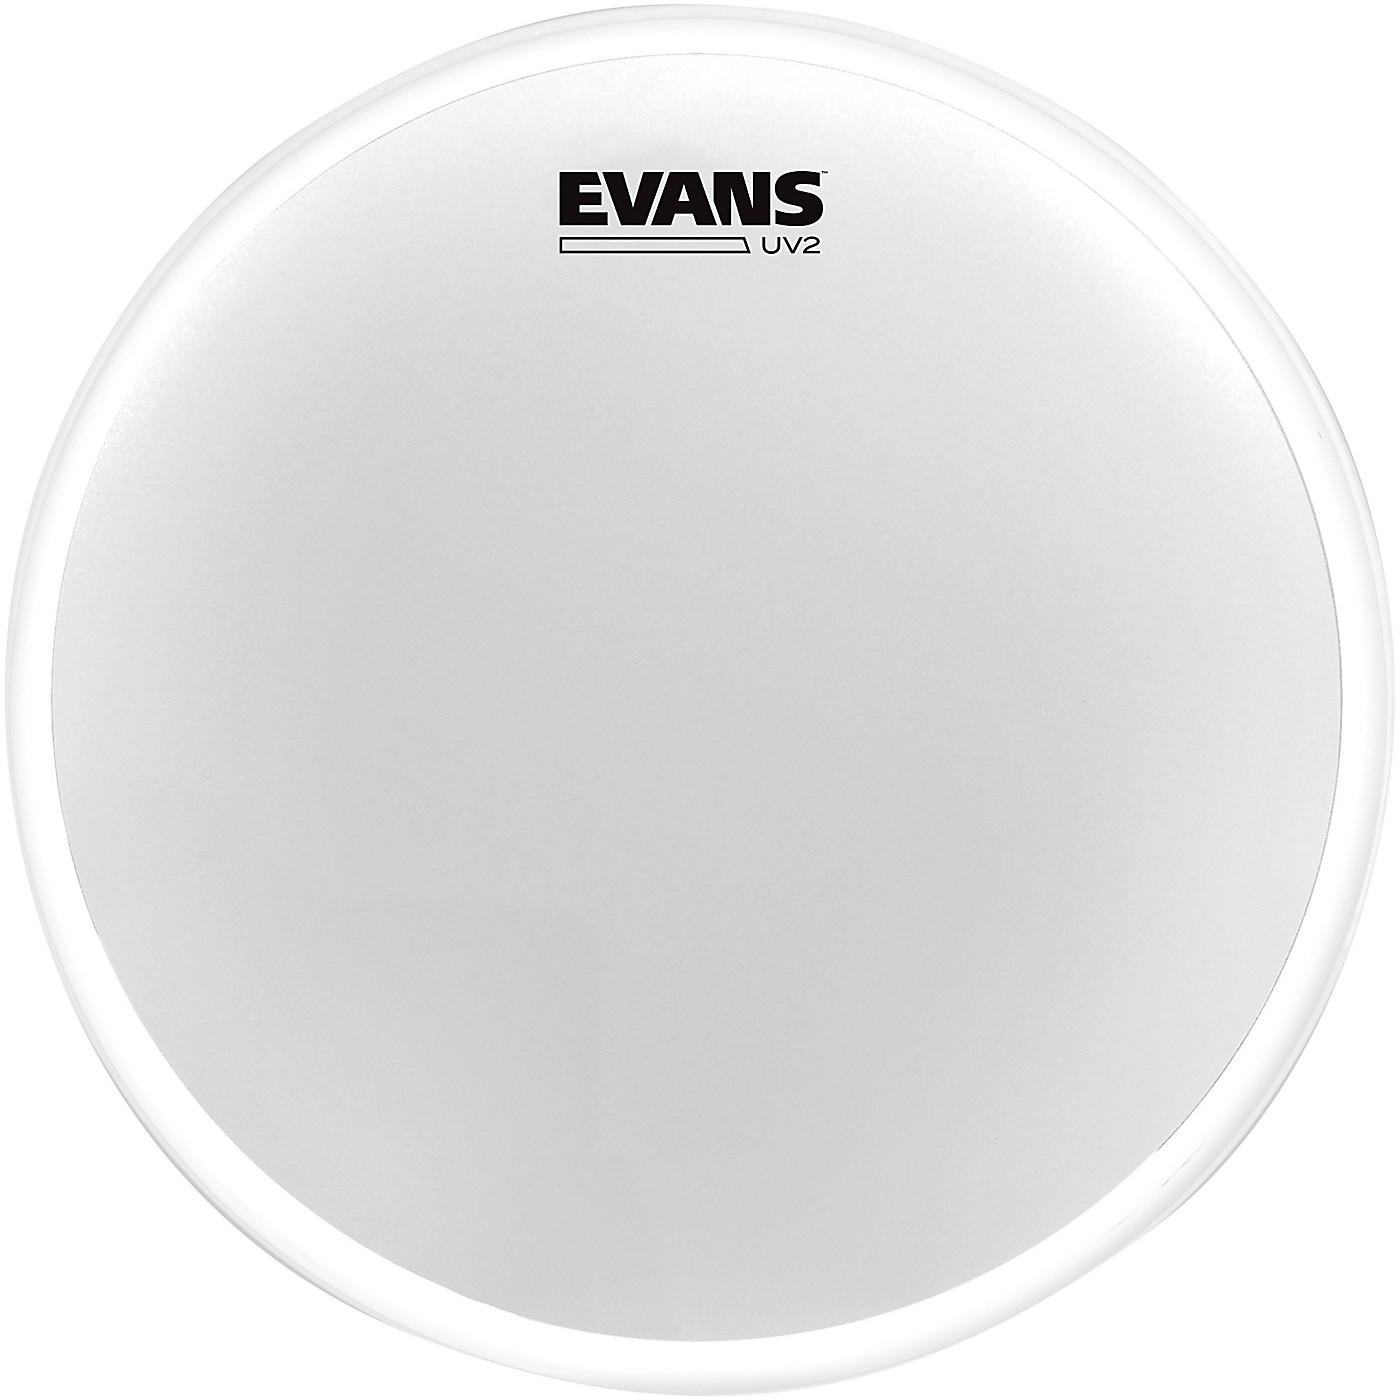 Evans UV2 Coated Drum Head thumbnail